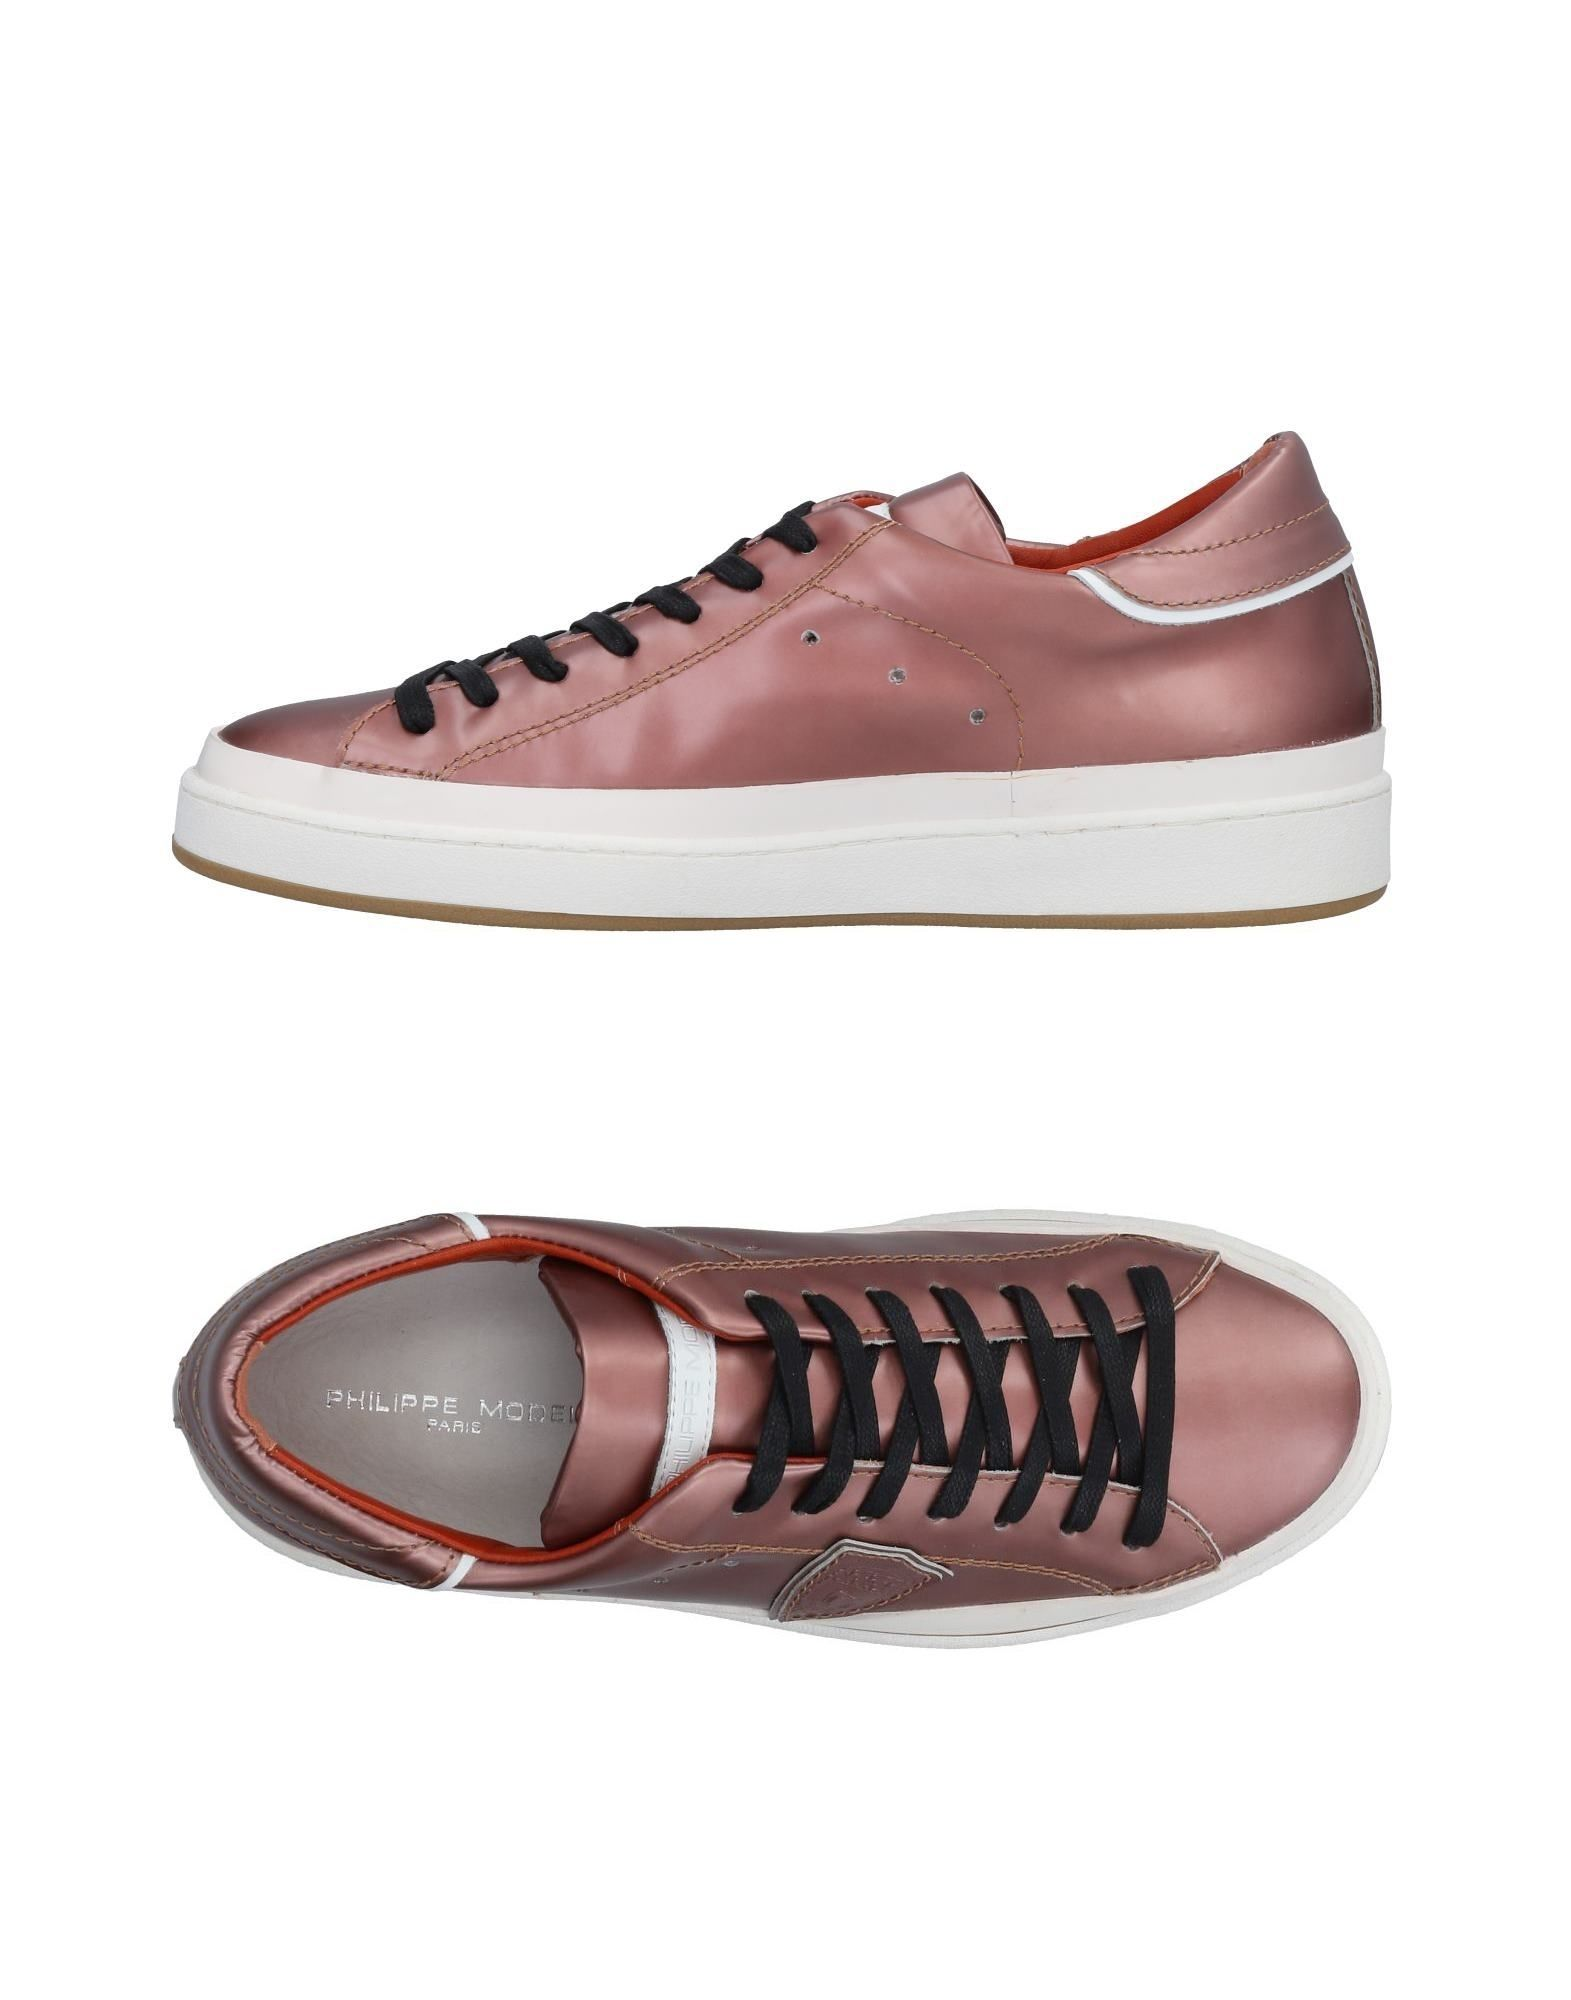 Philippe Model Sneakers Herren  Schuhe 11478489PQ Gute Qualität beliebte Schuhe  daf967